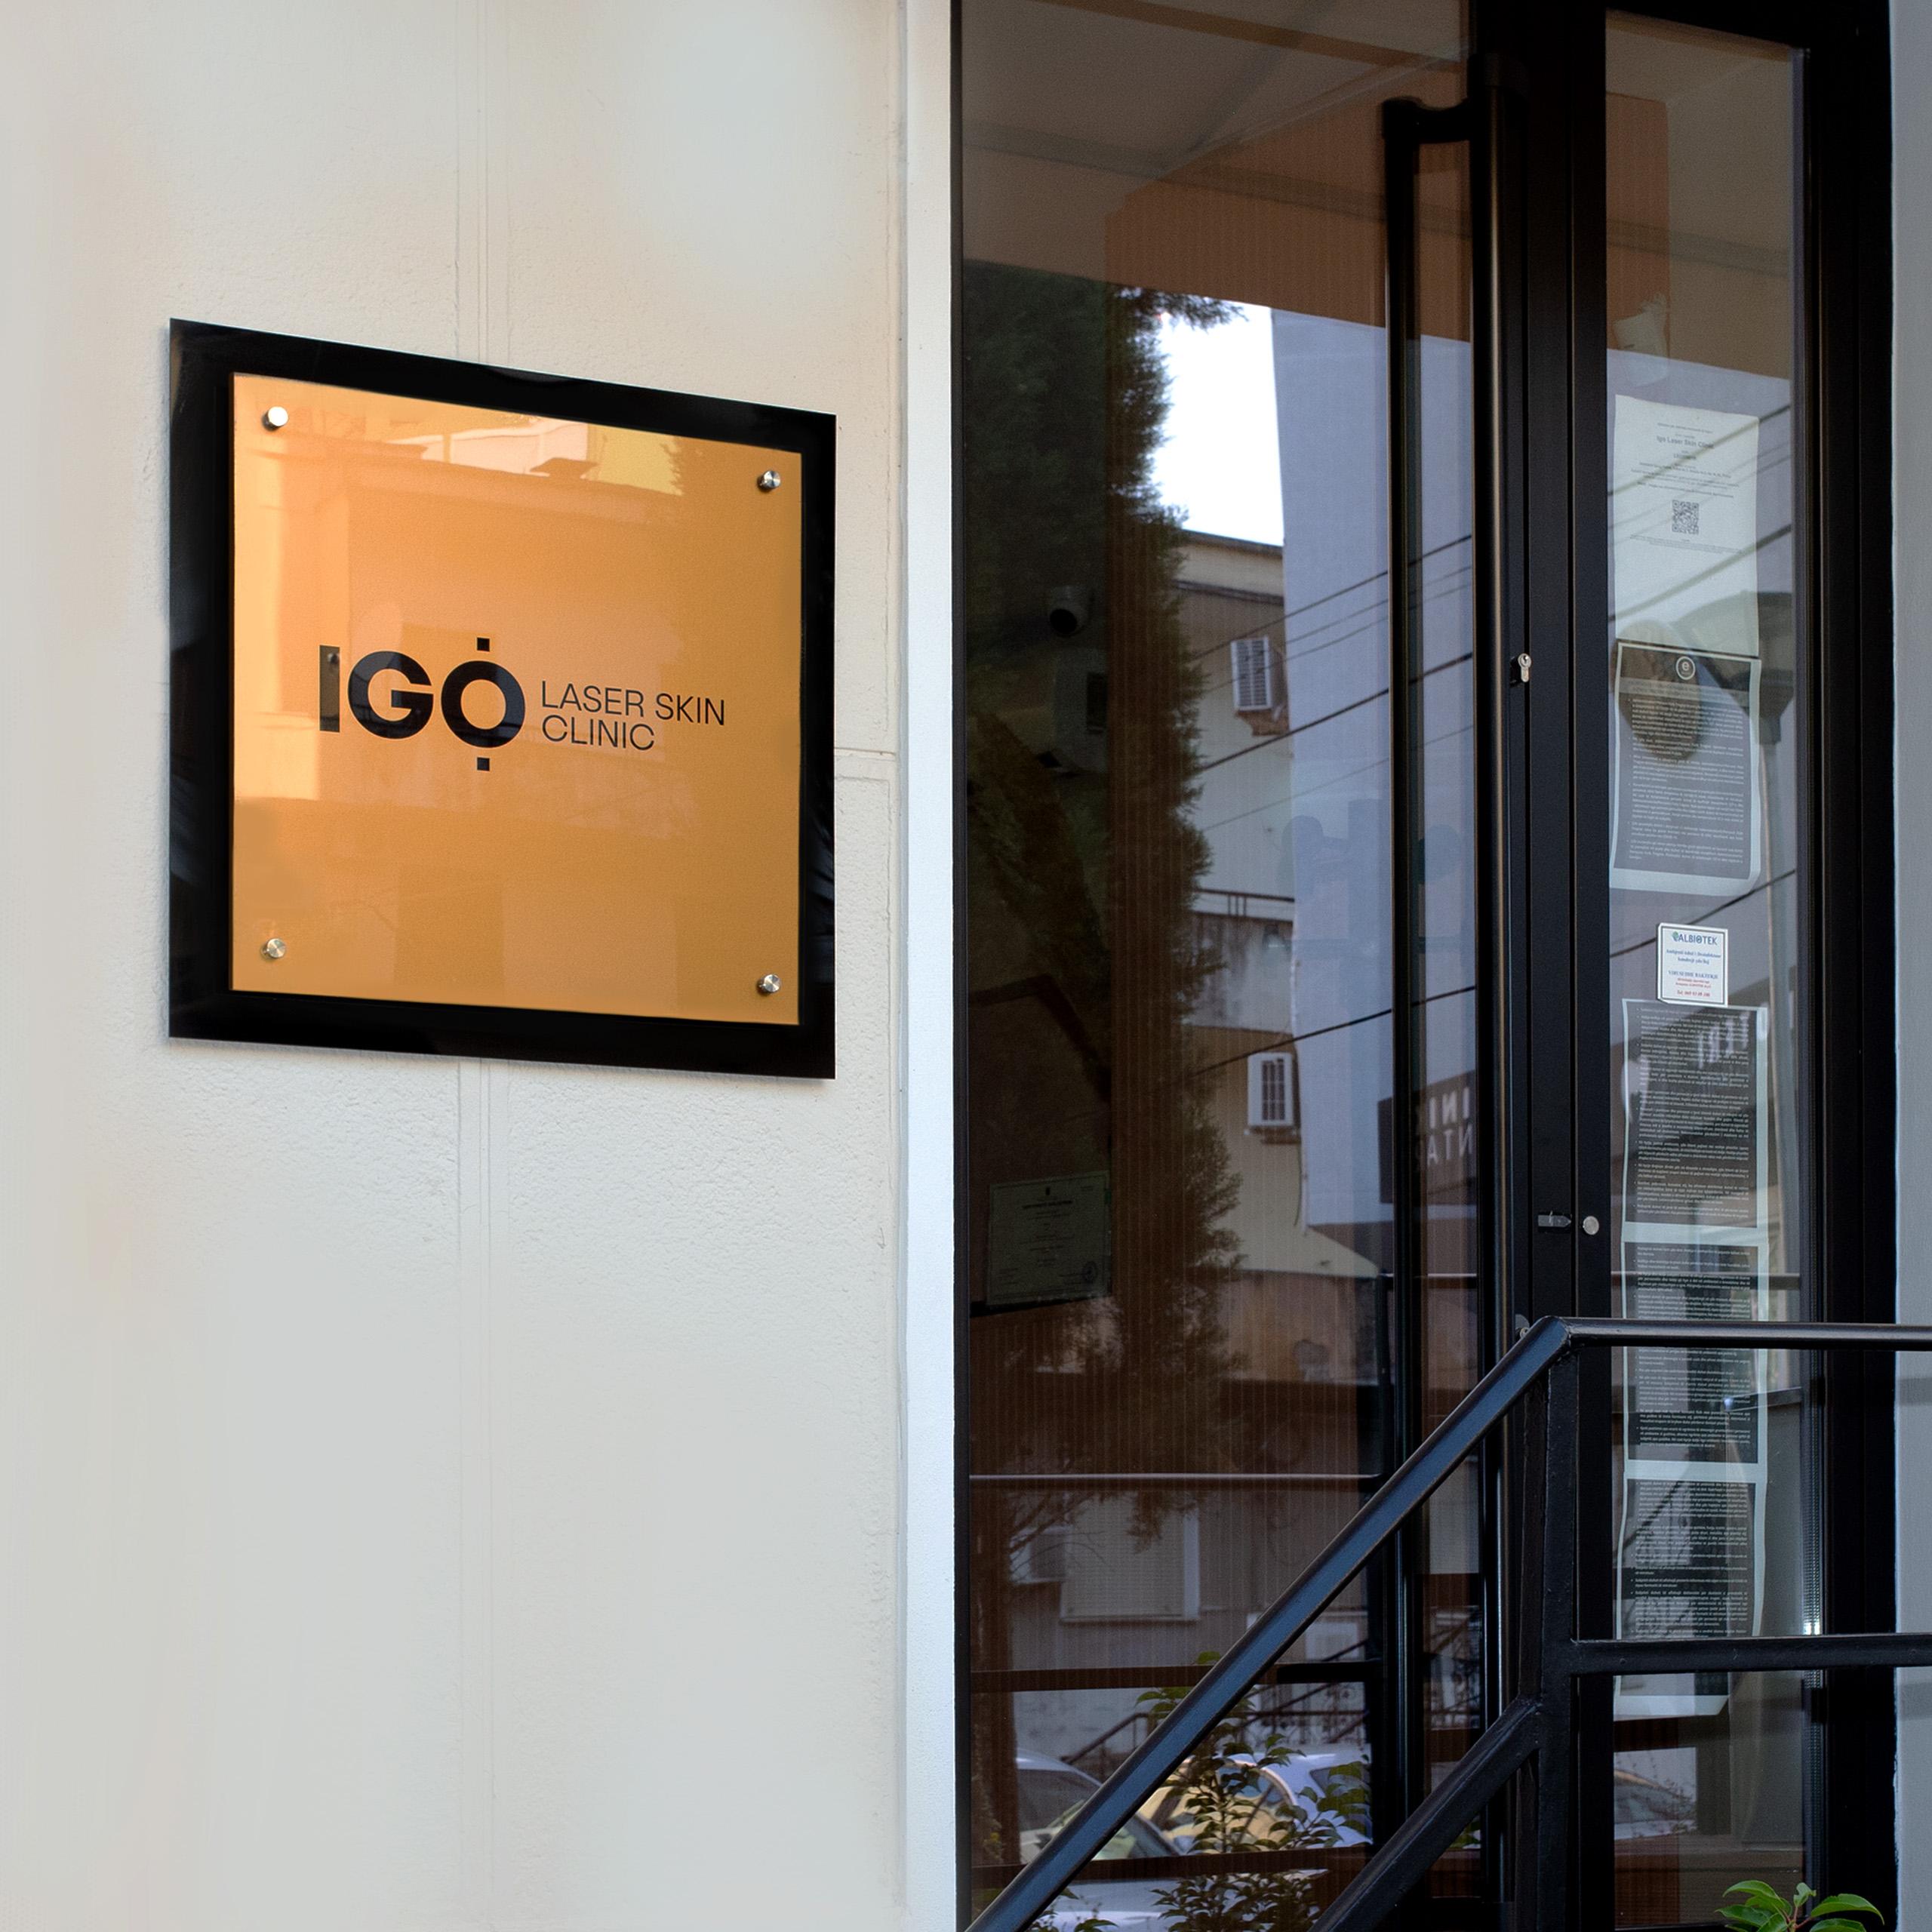 IGO Laser Skin Project Img 20 - Vatra Agency / Founder & CEO Gerton Bejo